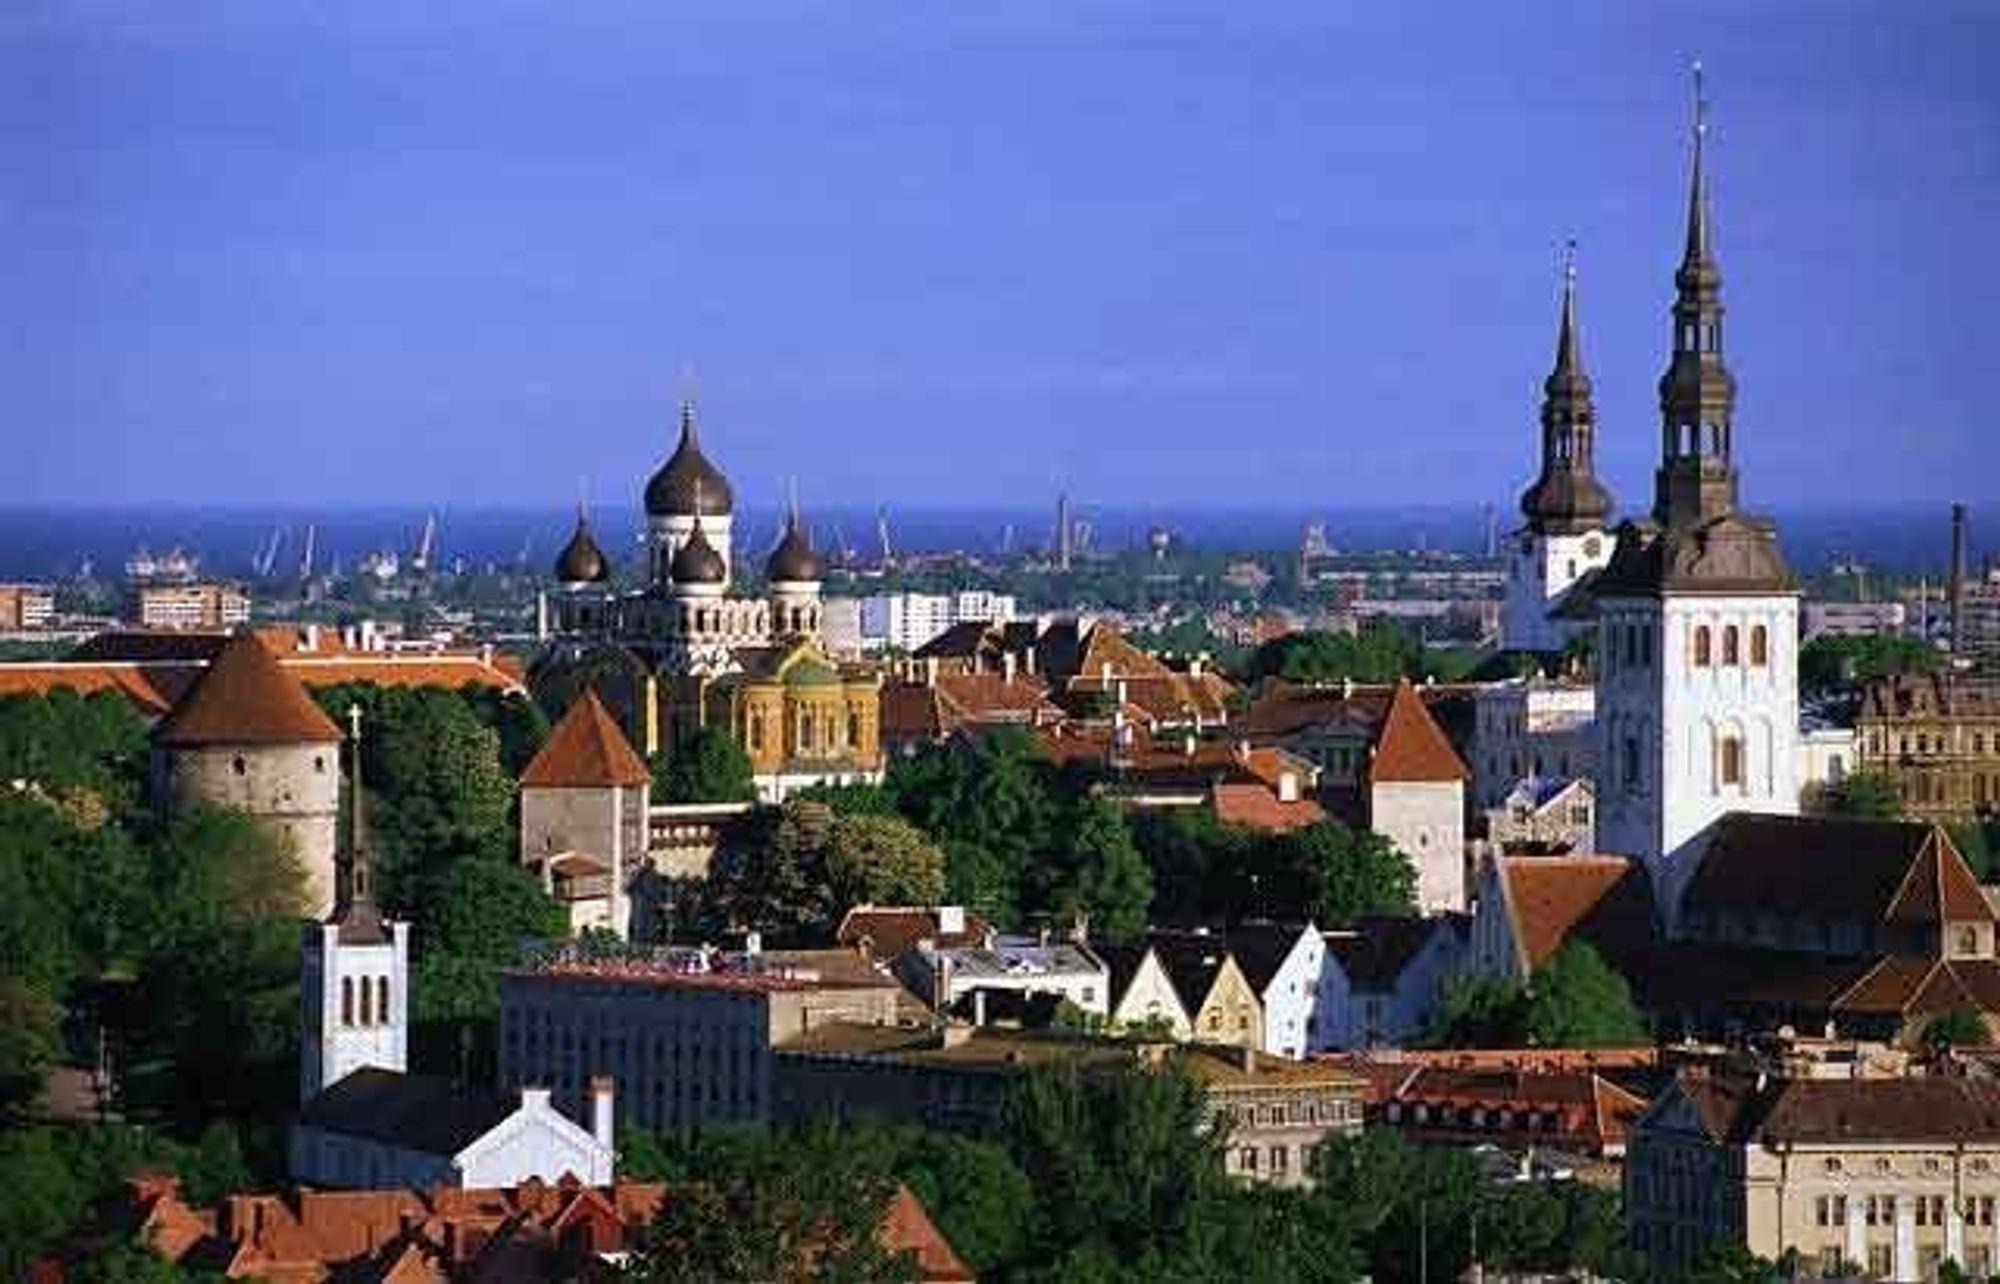 Internett-valg i Estland